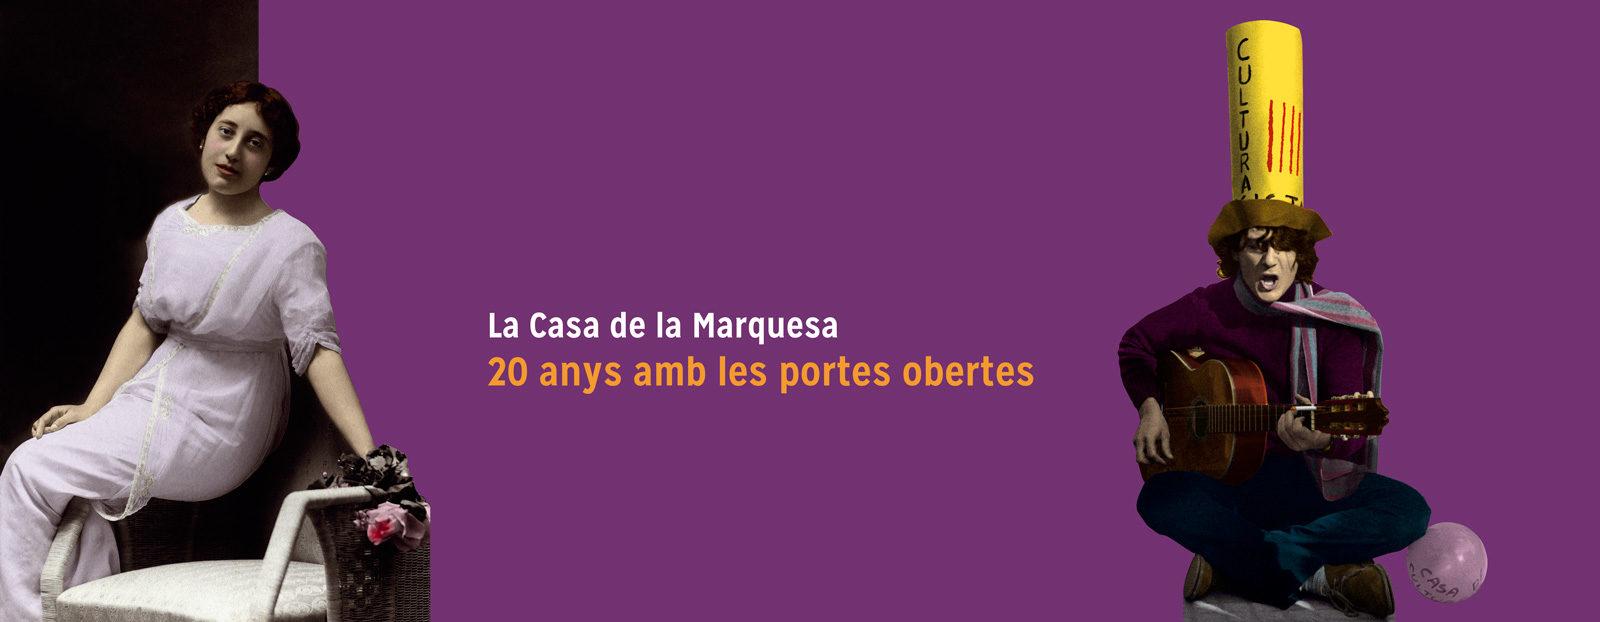 20AnysCasaMarquesa-Gandia-Espirelius-carrusel-3